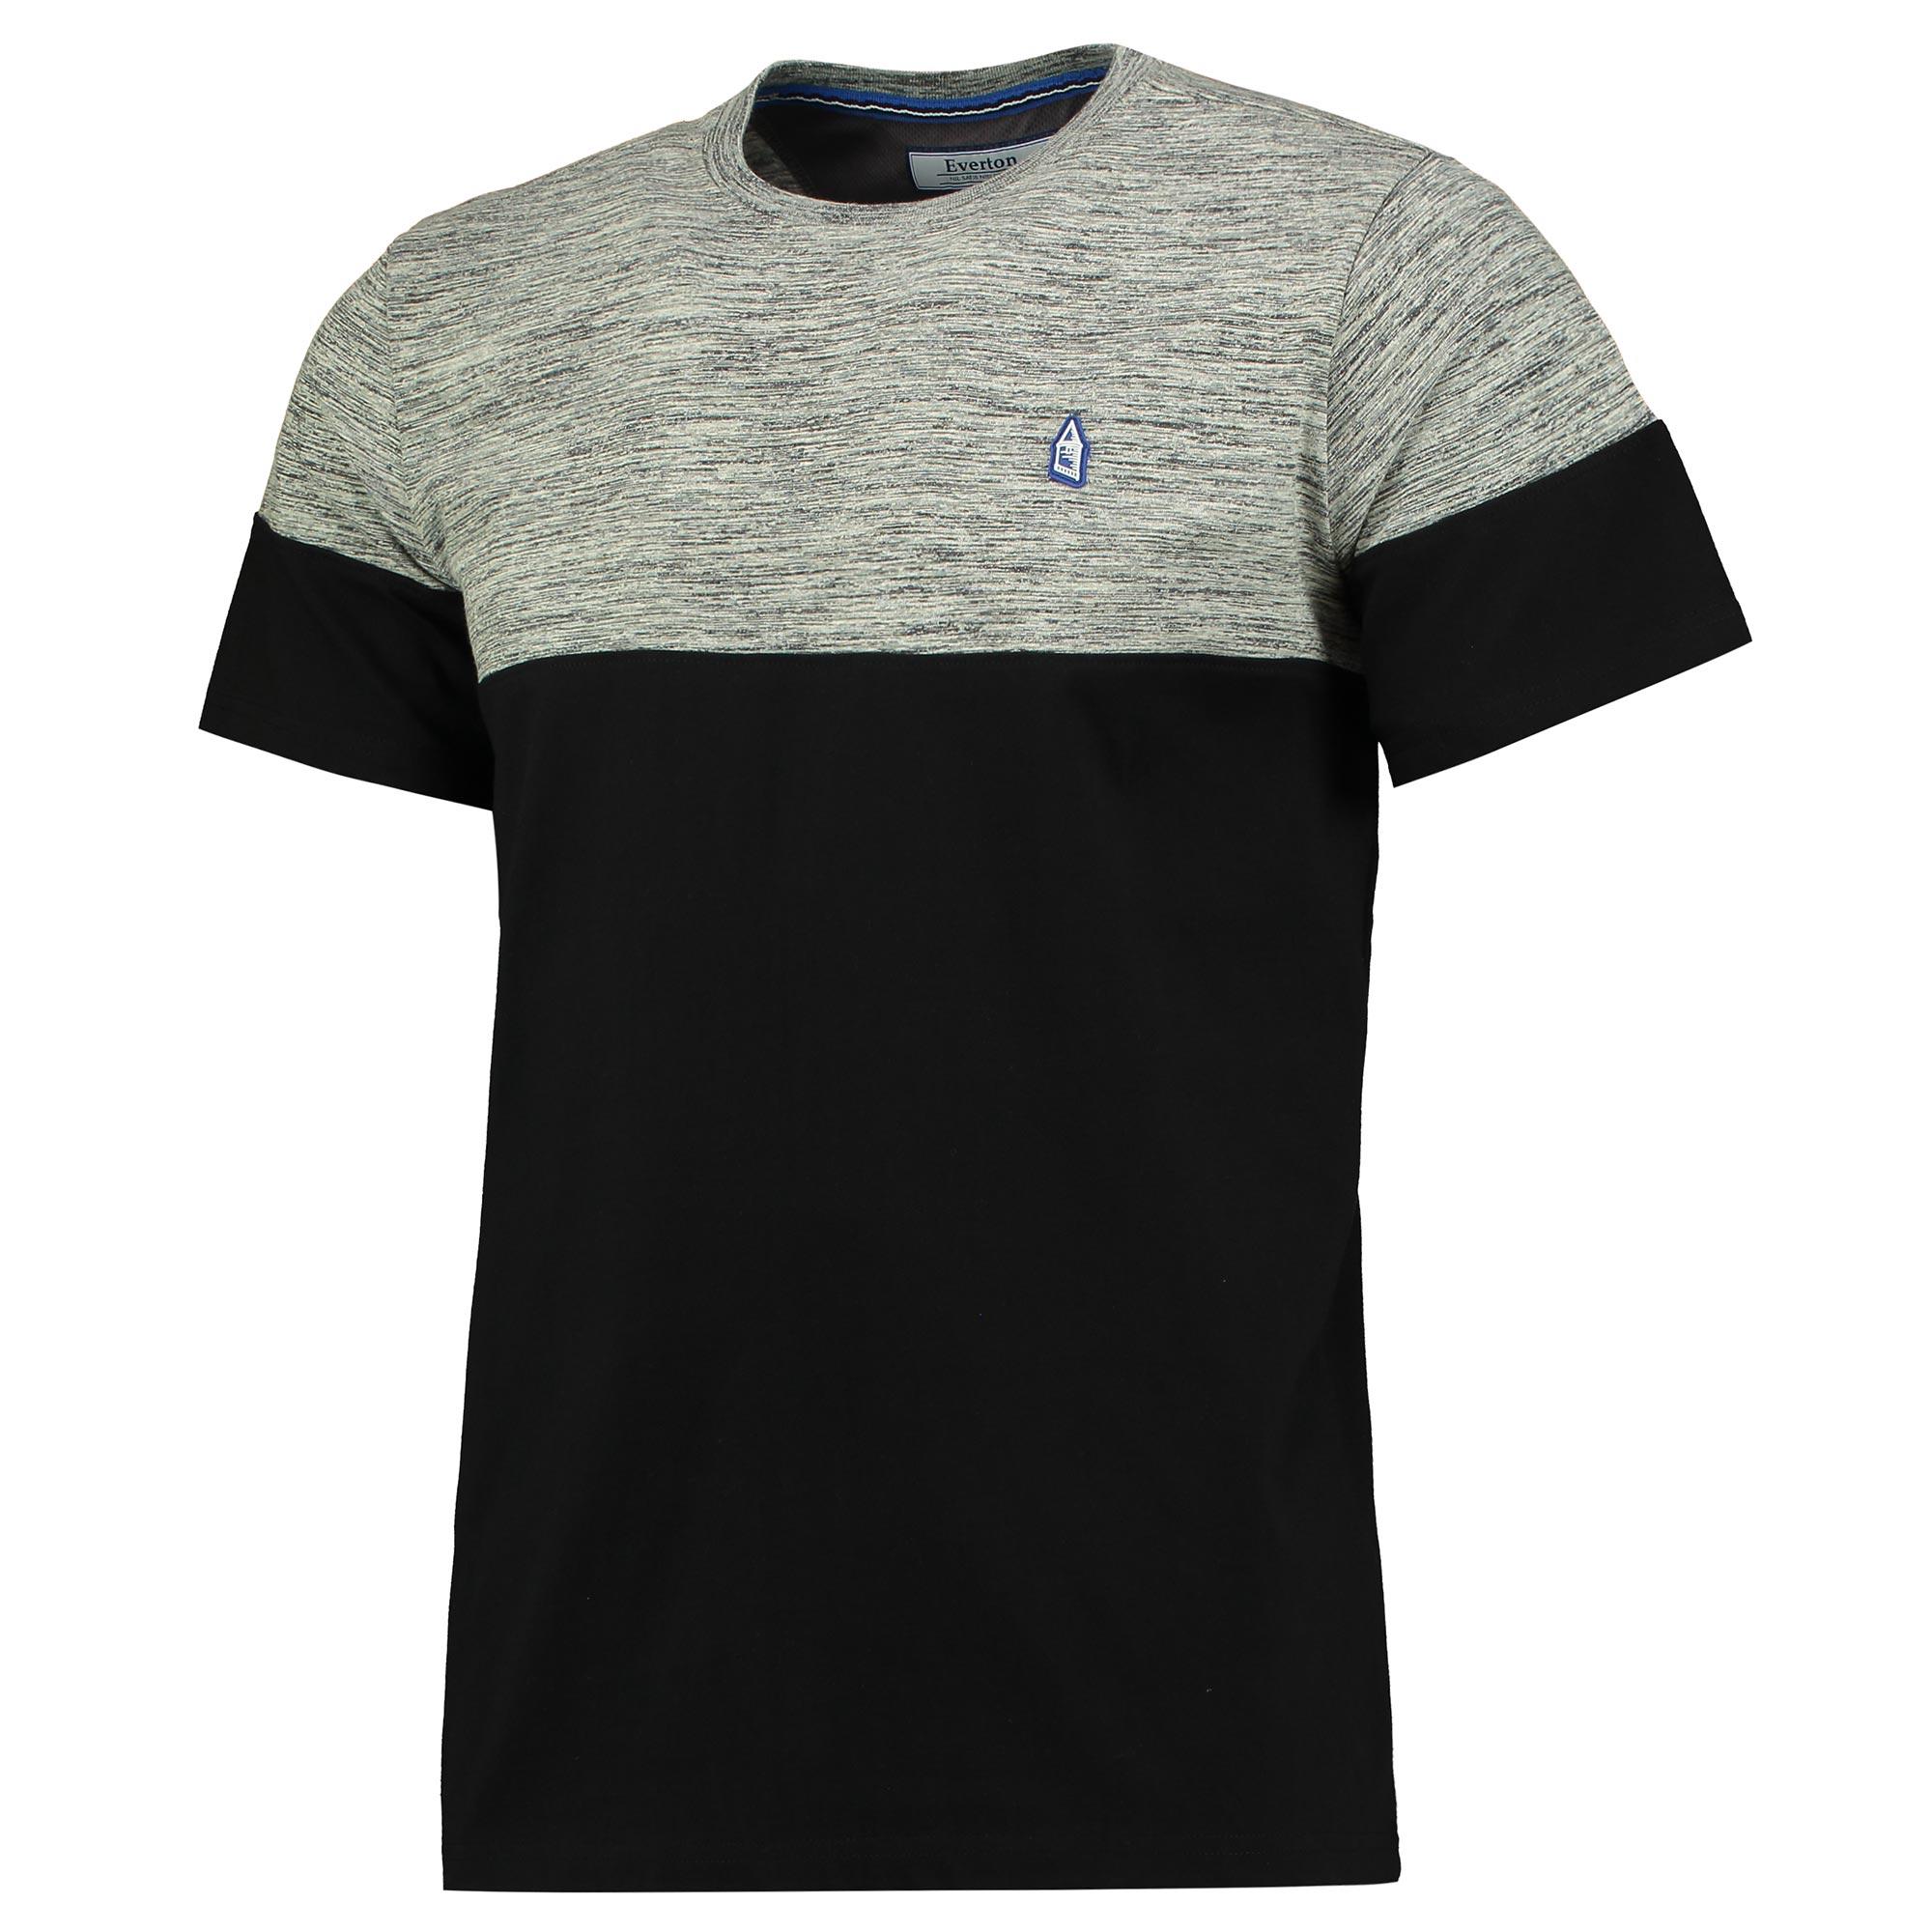 Everton Terrace T-Shirt - Charcoal